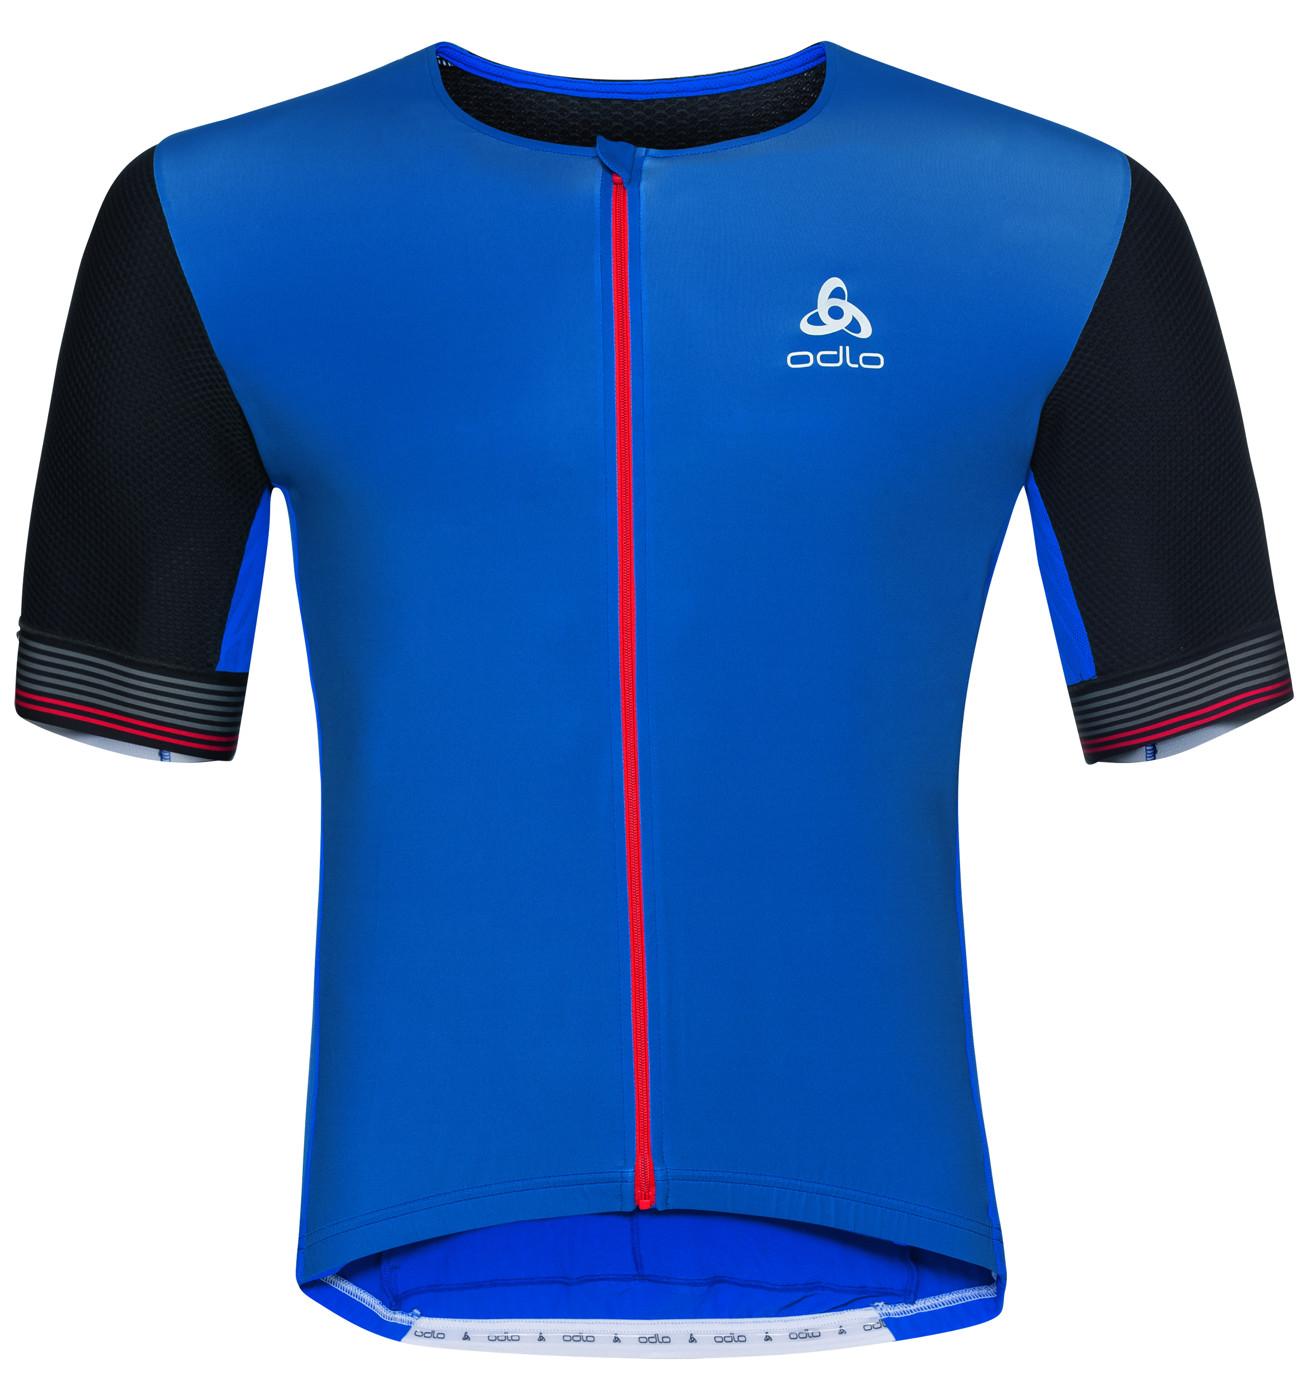 ODLO Shirt s/s full zip CERAMICOOL - Herren